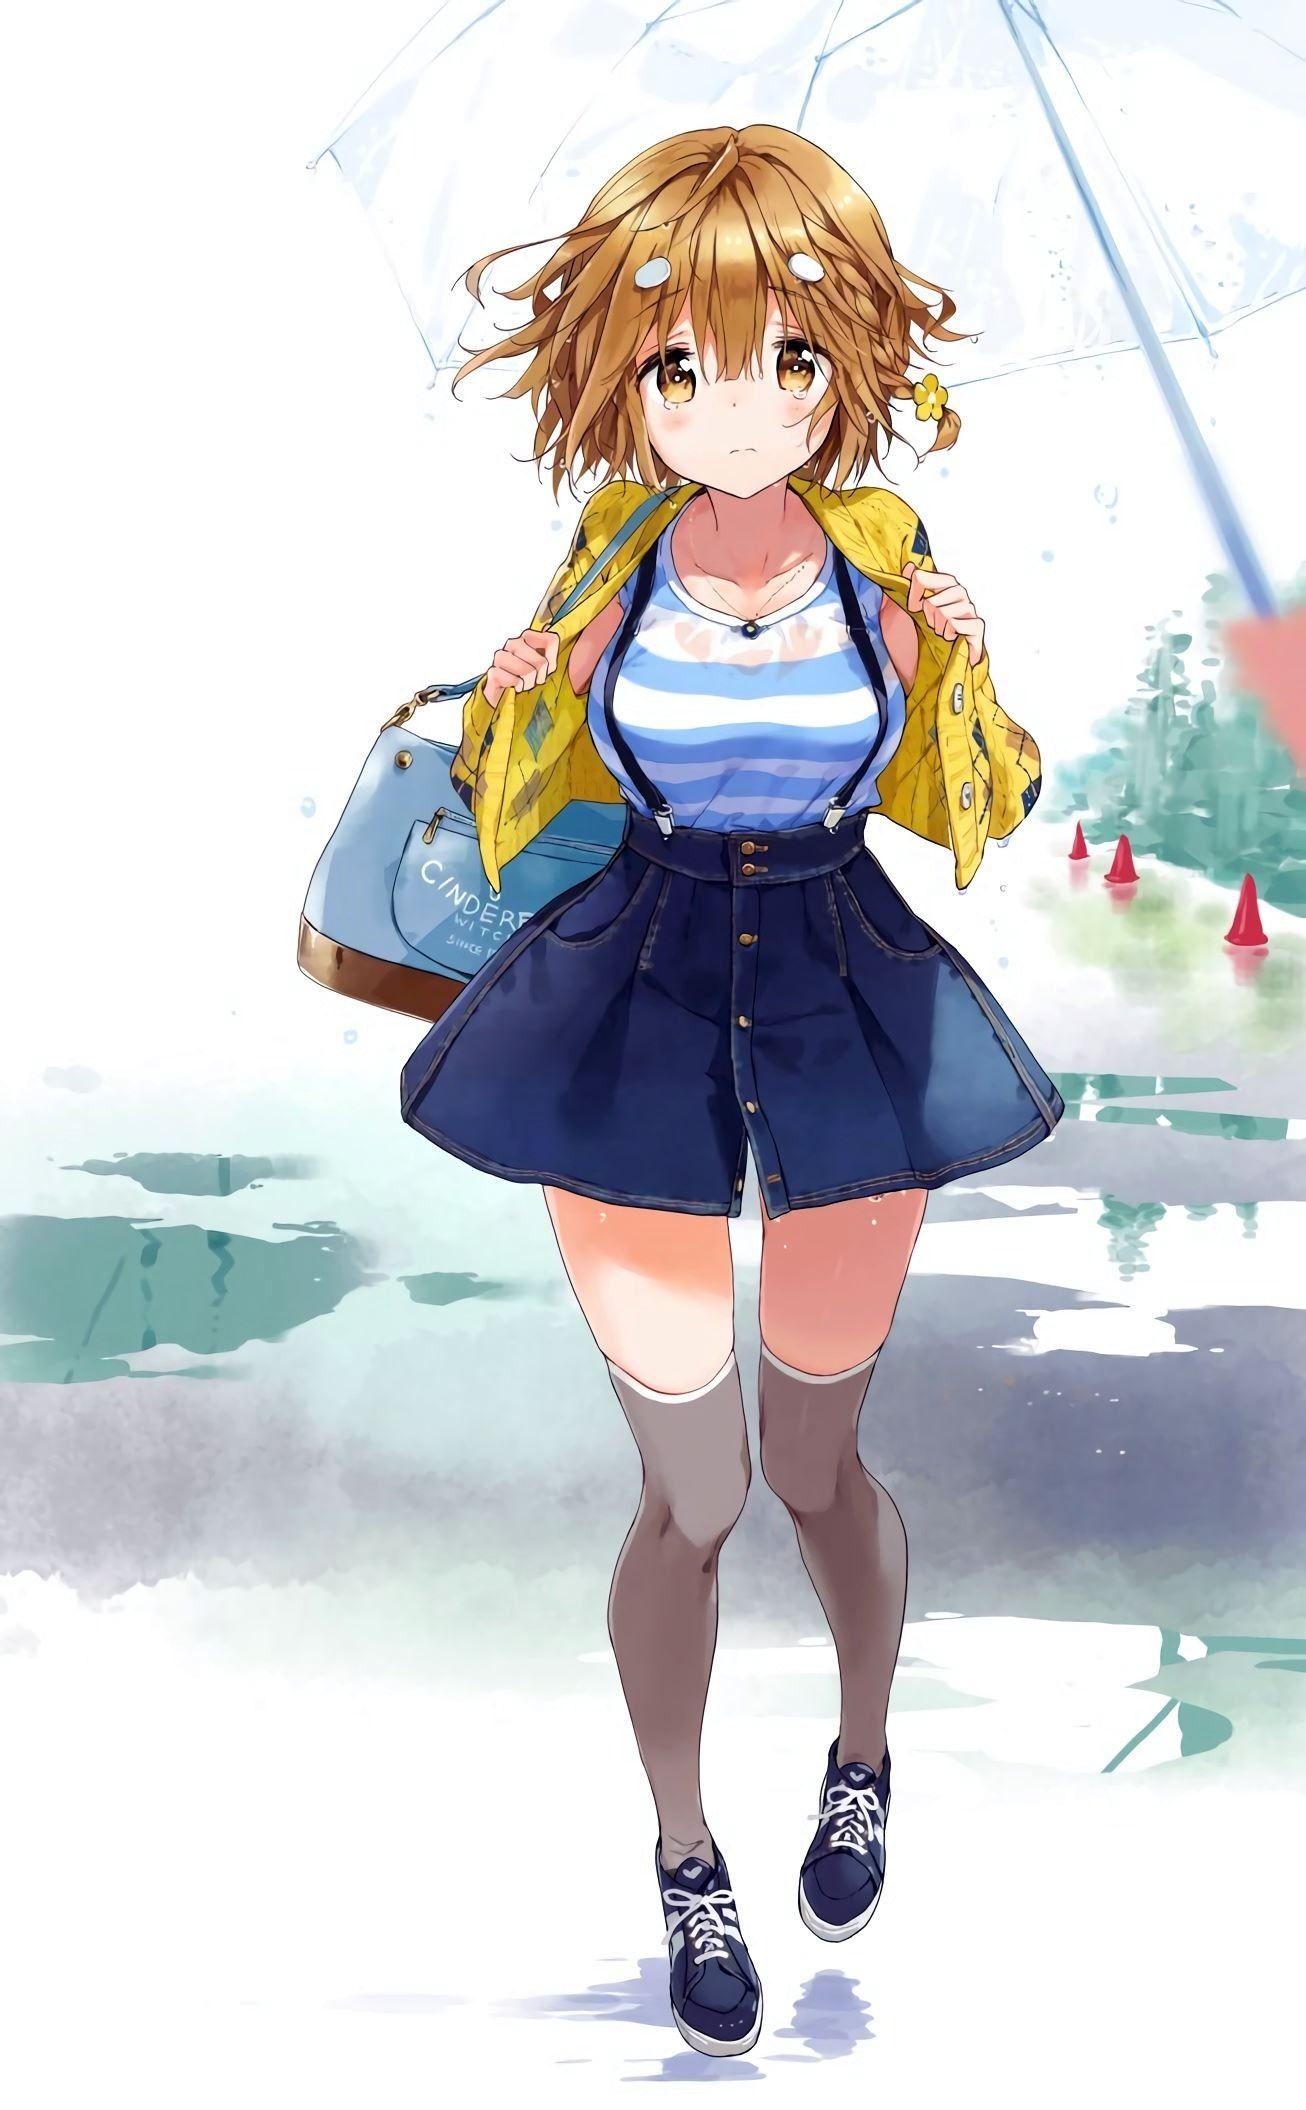 Anime 1306x2110 Masamune kun no Revenge see through clothing sweater